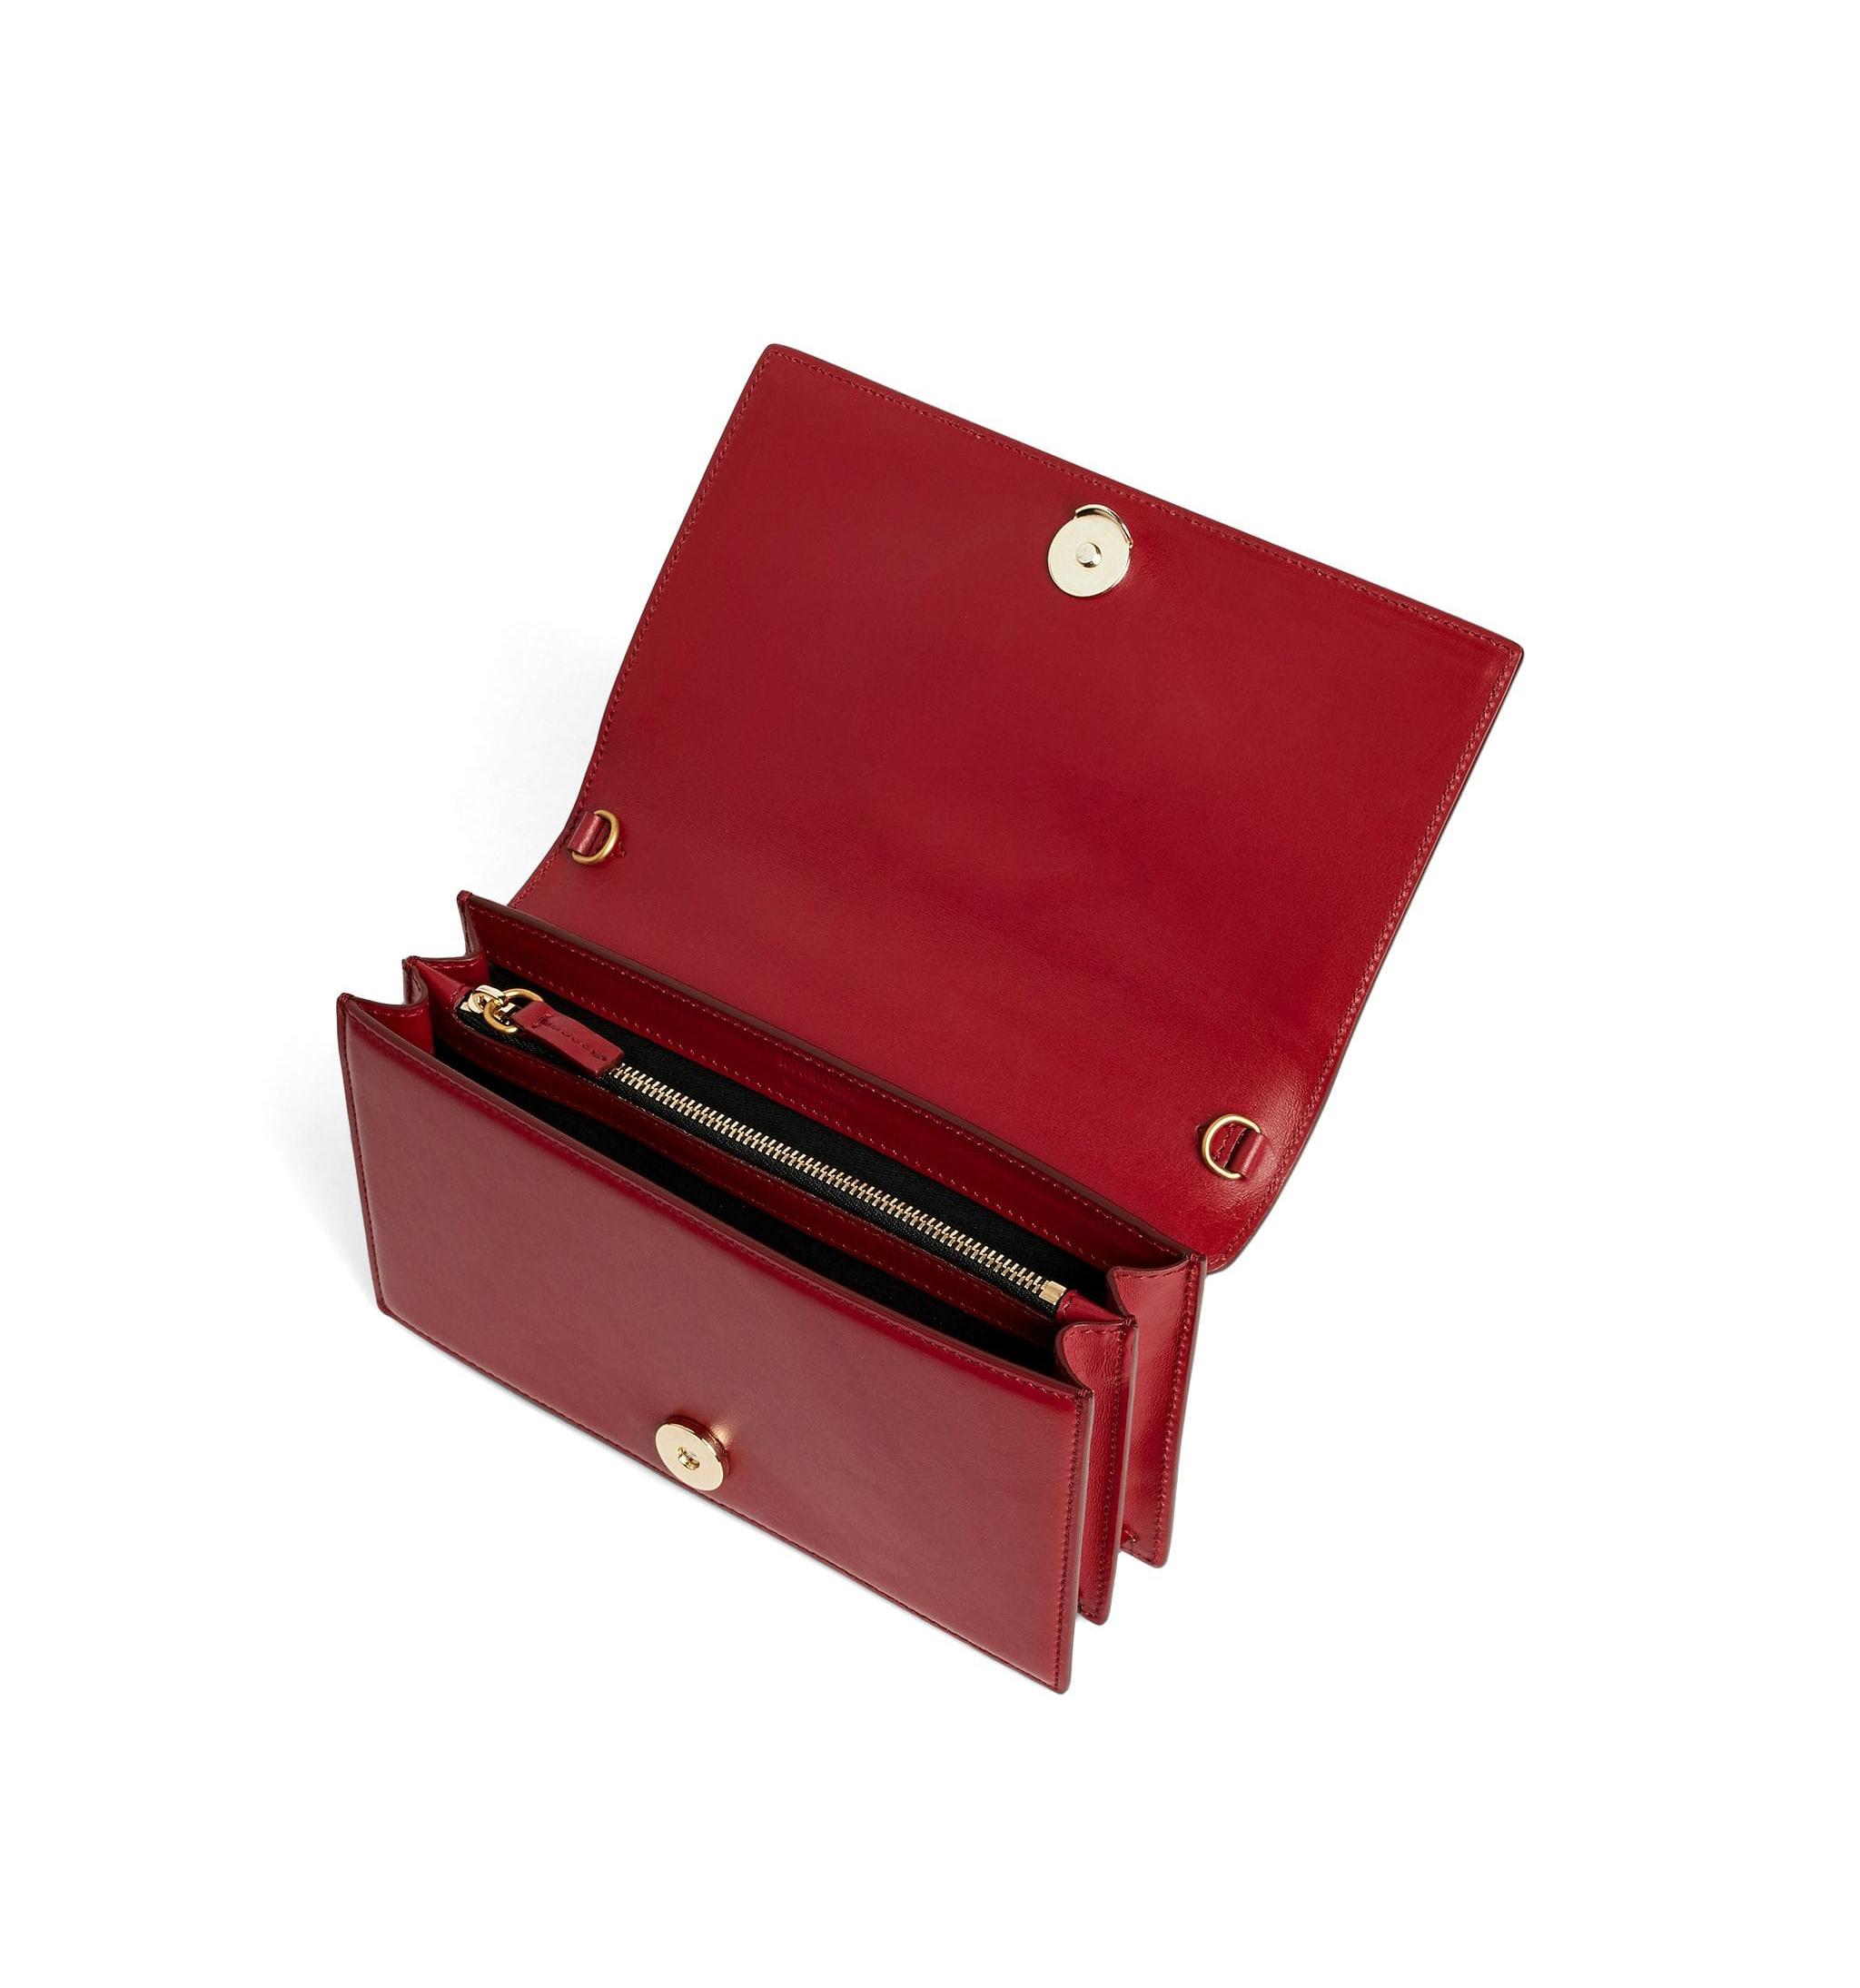 roberto-cavalli-mirror-snake-logo-shoulder-bag_12944884_14226383_2048